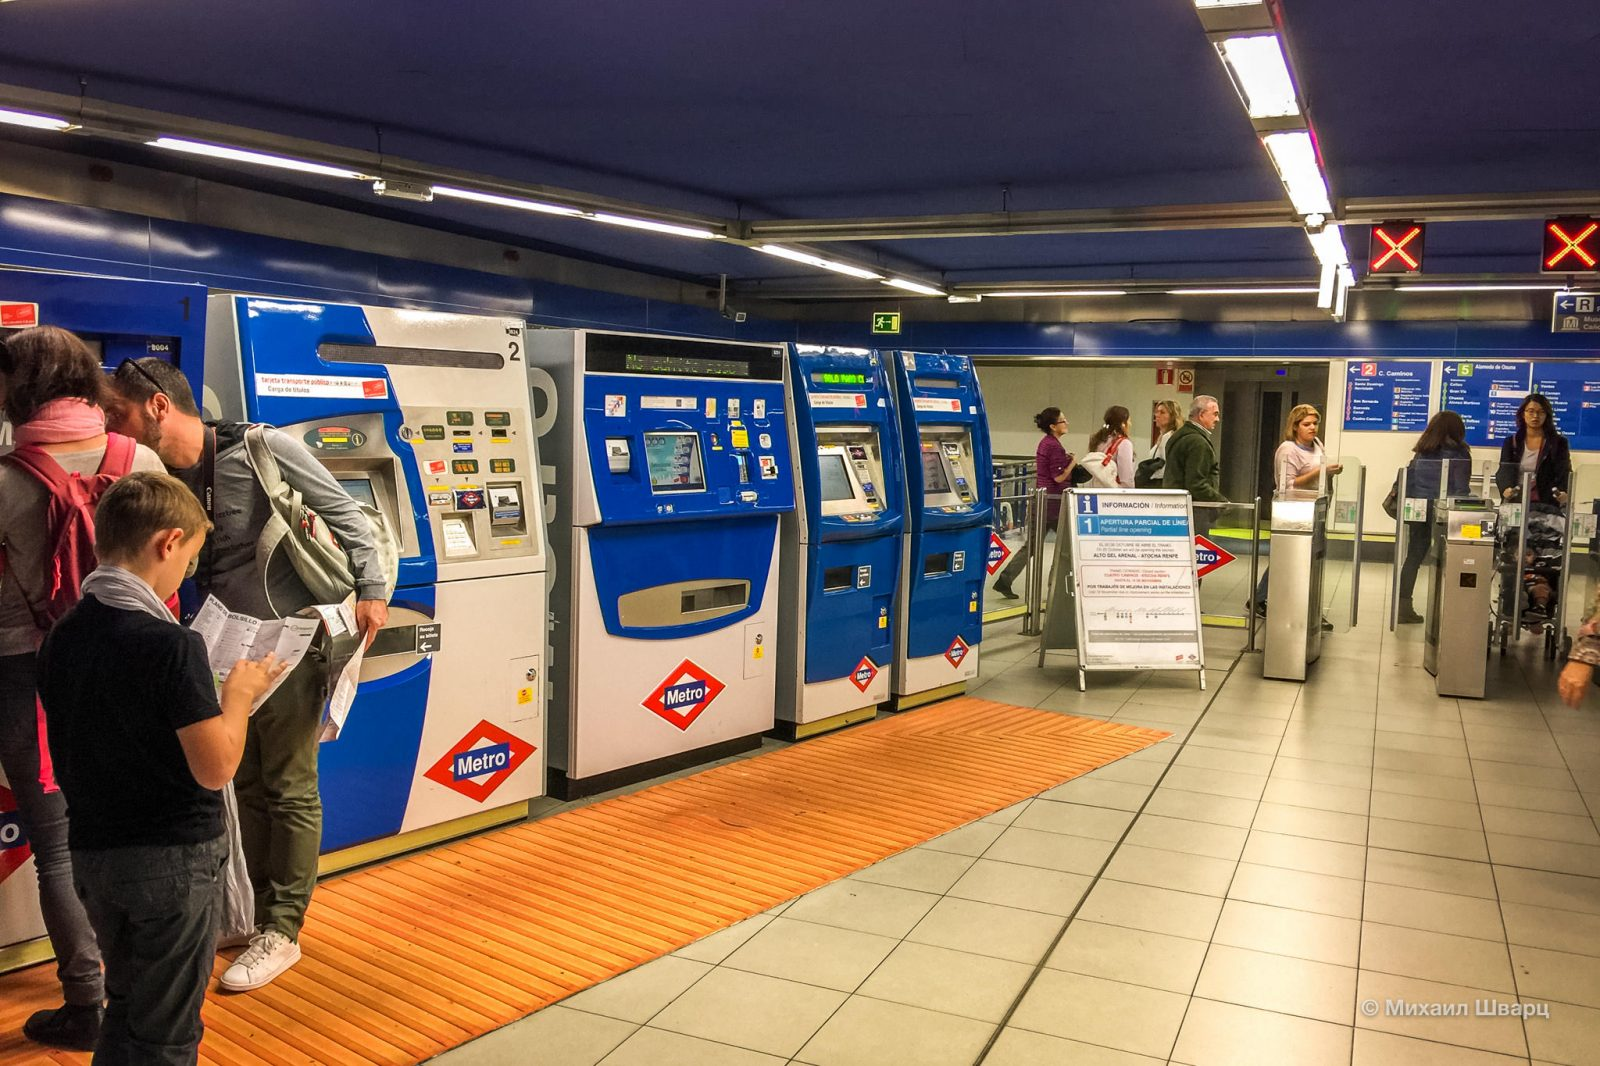 Автоматы по продаже билетов на станциях метро